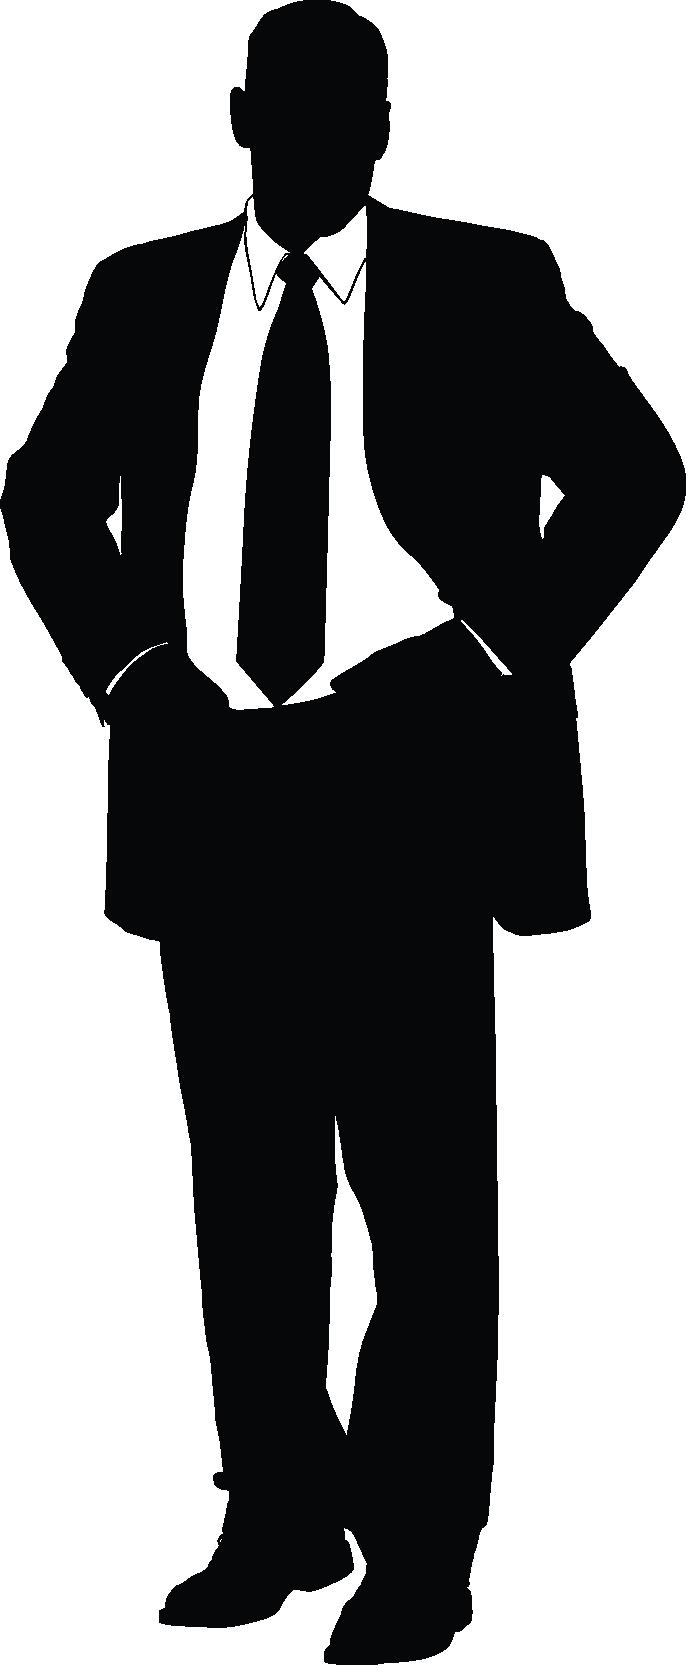 Employee clipart silhouette. Man string art idea